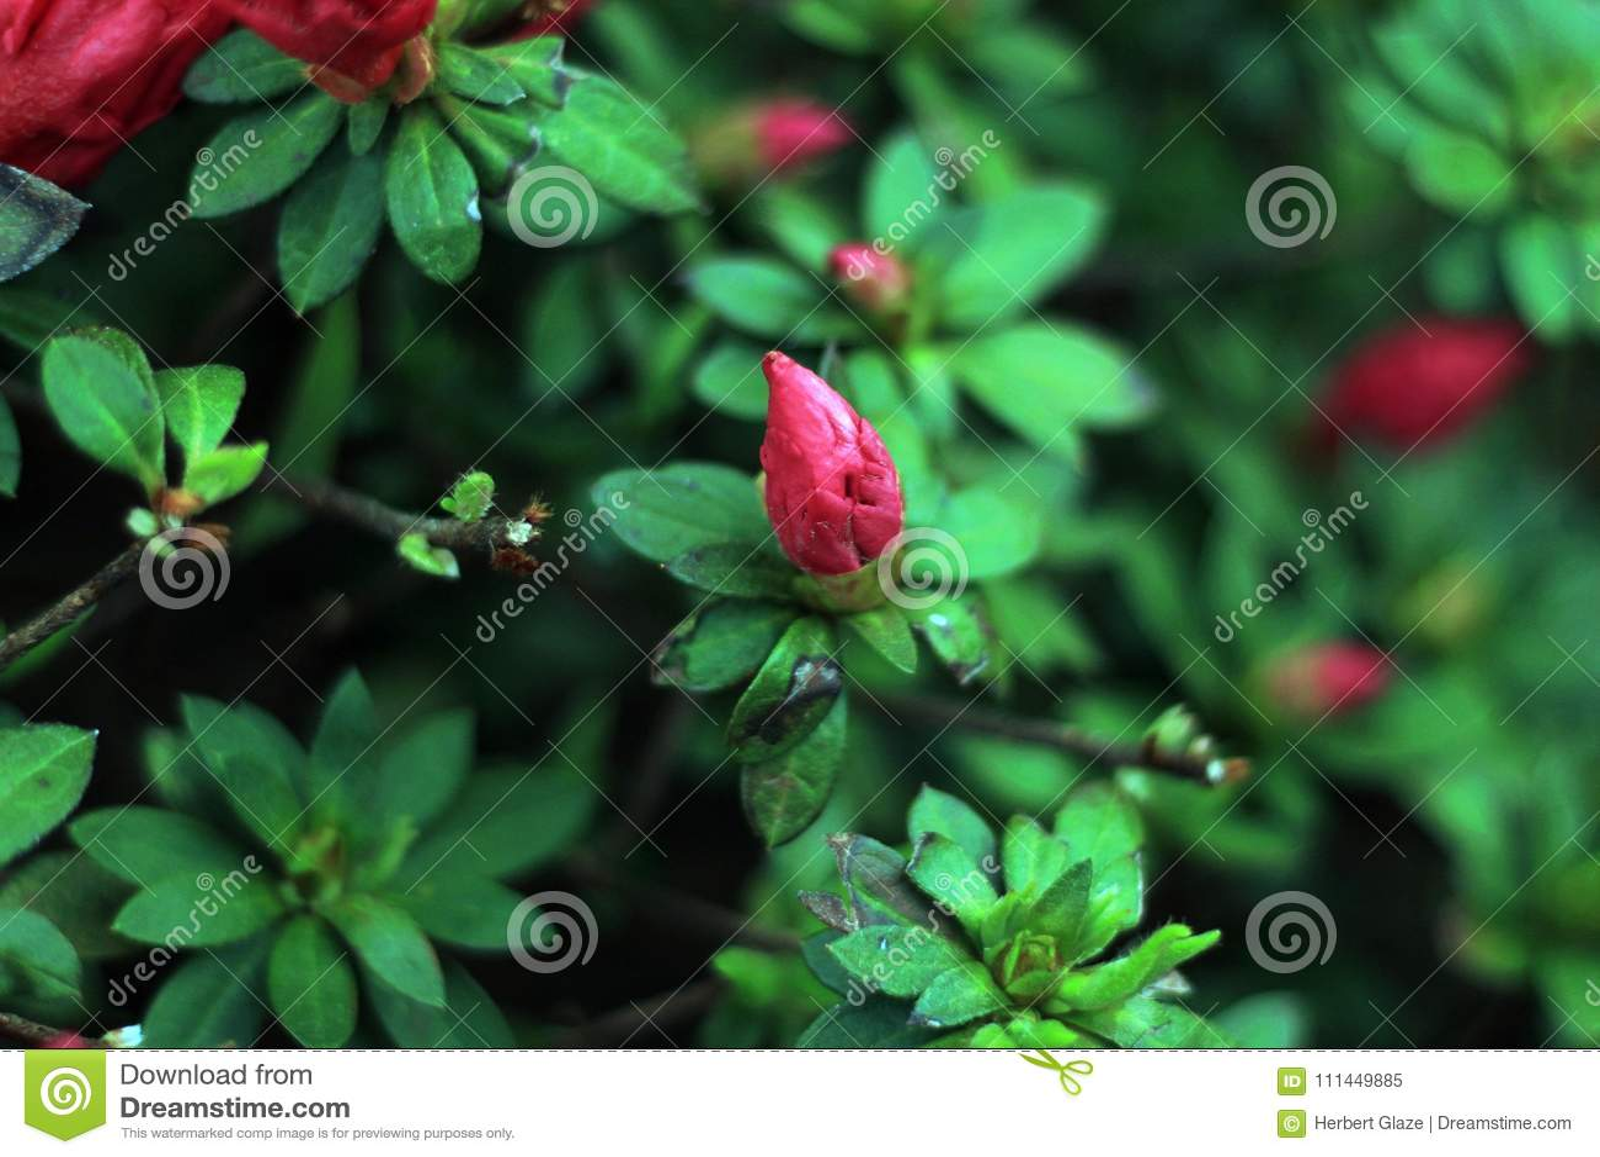 Chinense Loropetalum как китайский кра-цветок